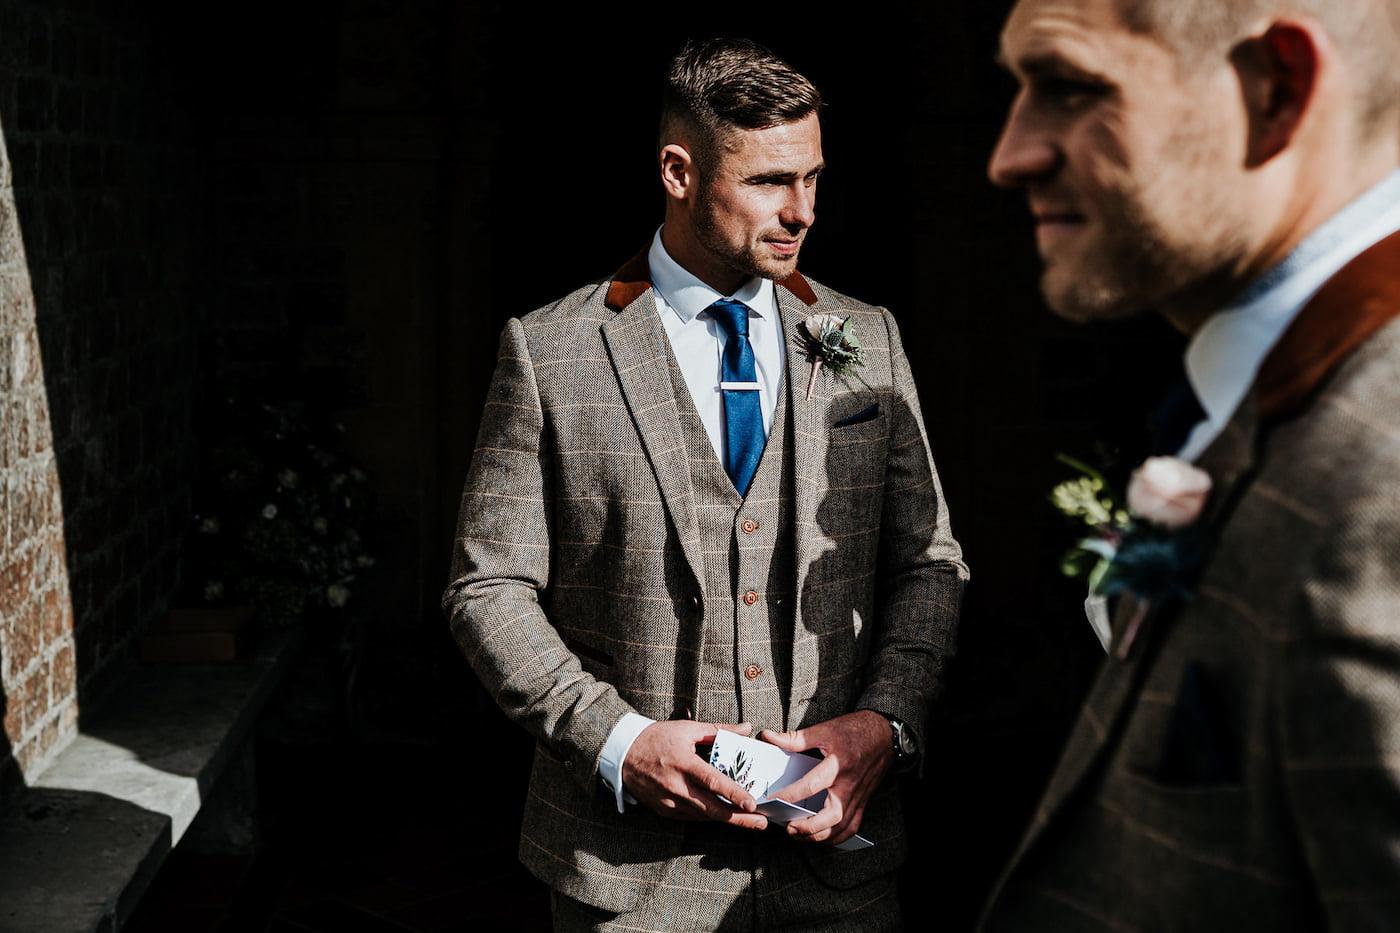 wedding groomsmen handing out stationary